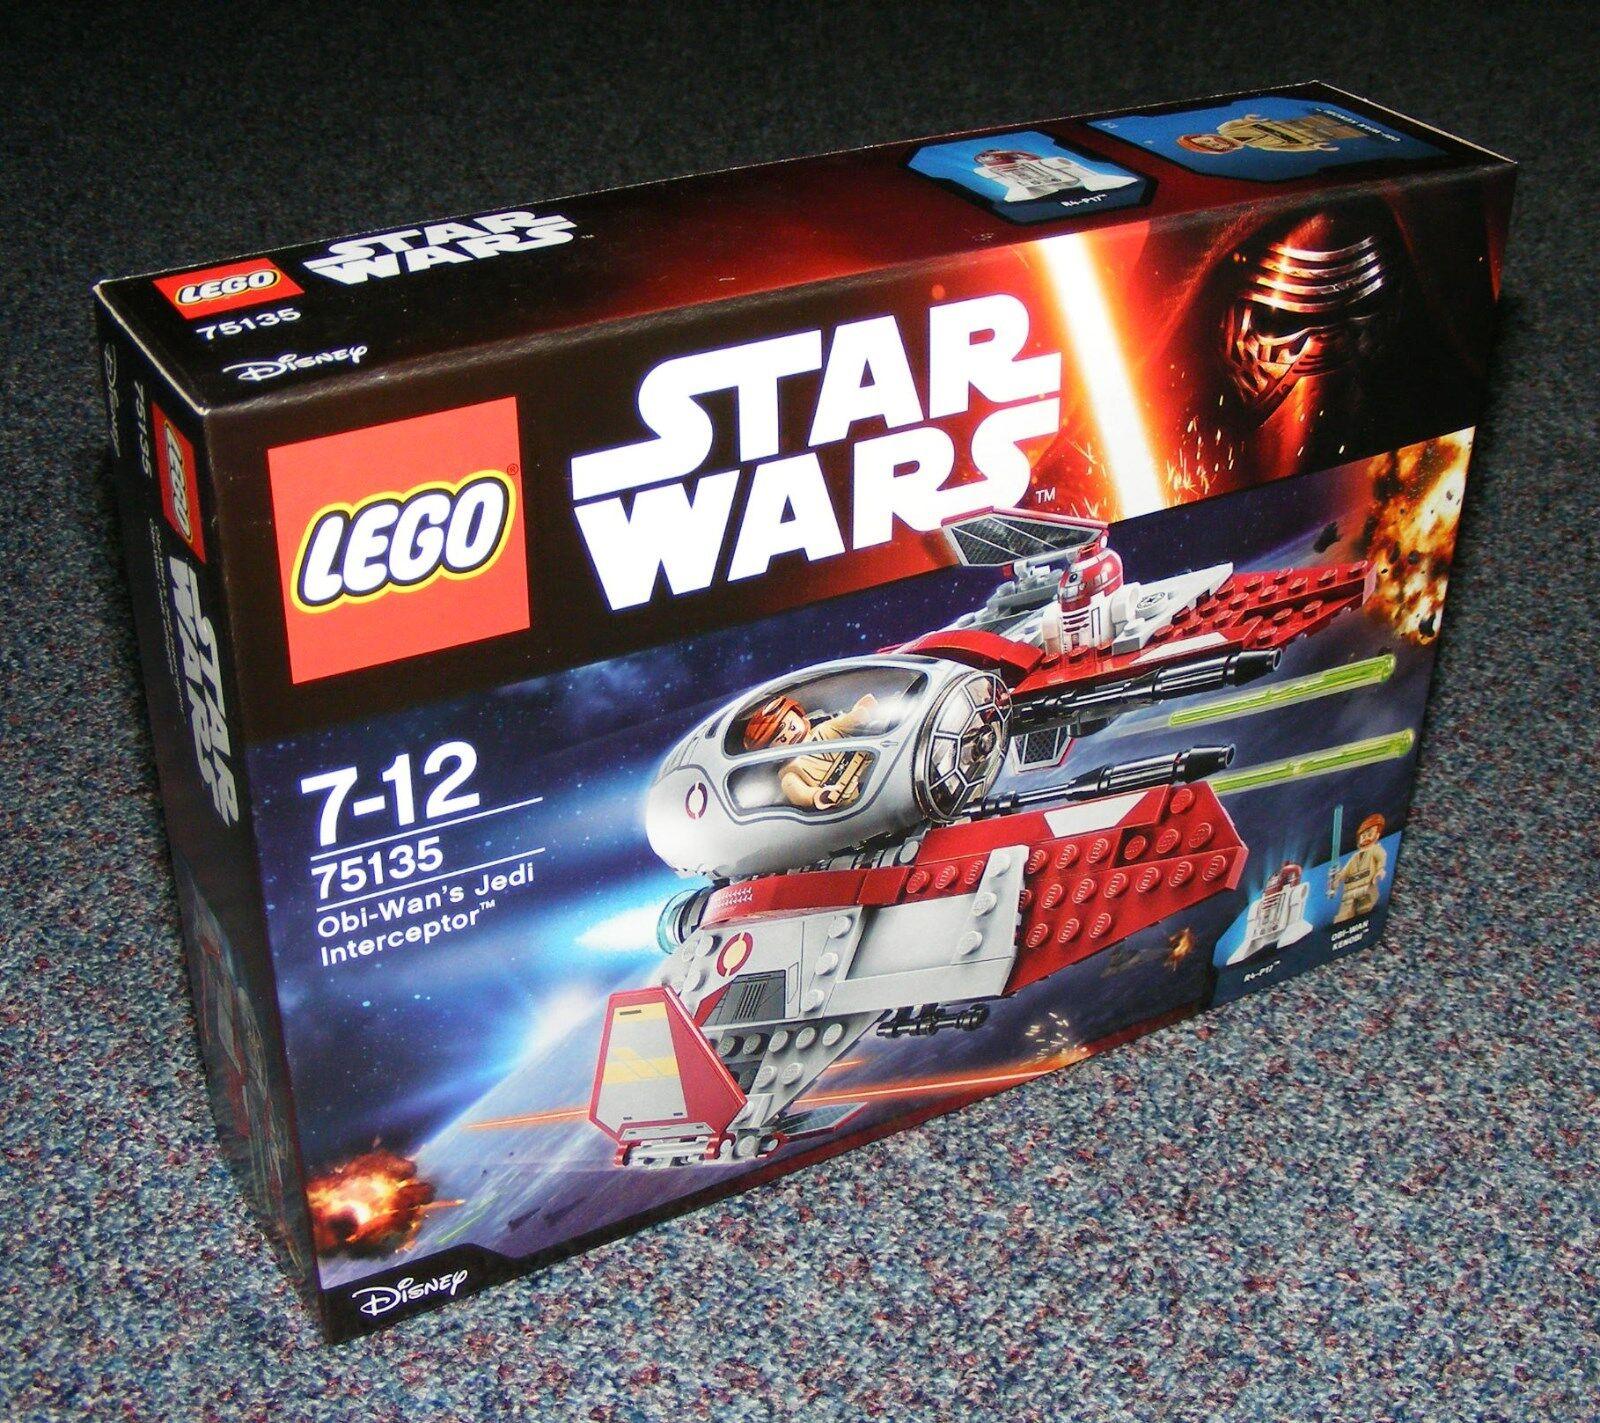 STAR WARS LEGO 75135 OBI-WAN'S JEDI INTERCEPTOR BRAND BRAND BRAND NEW SEALED 5d864c